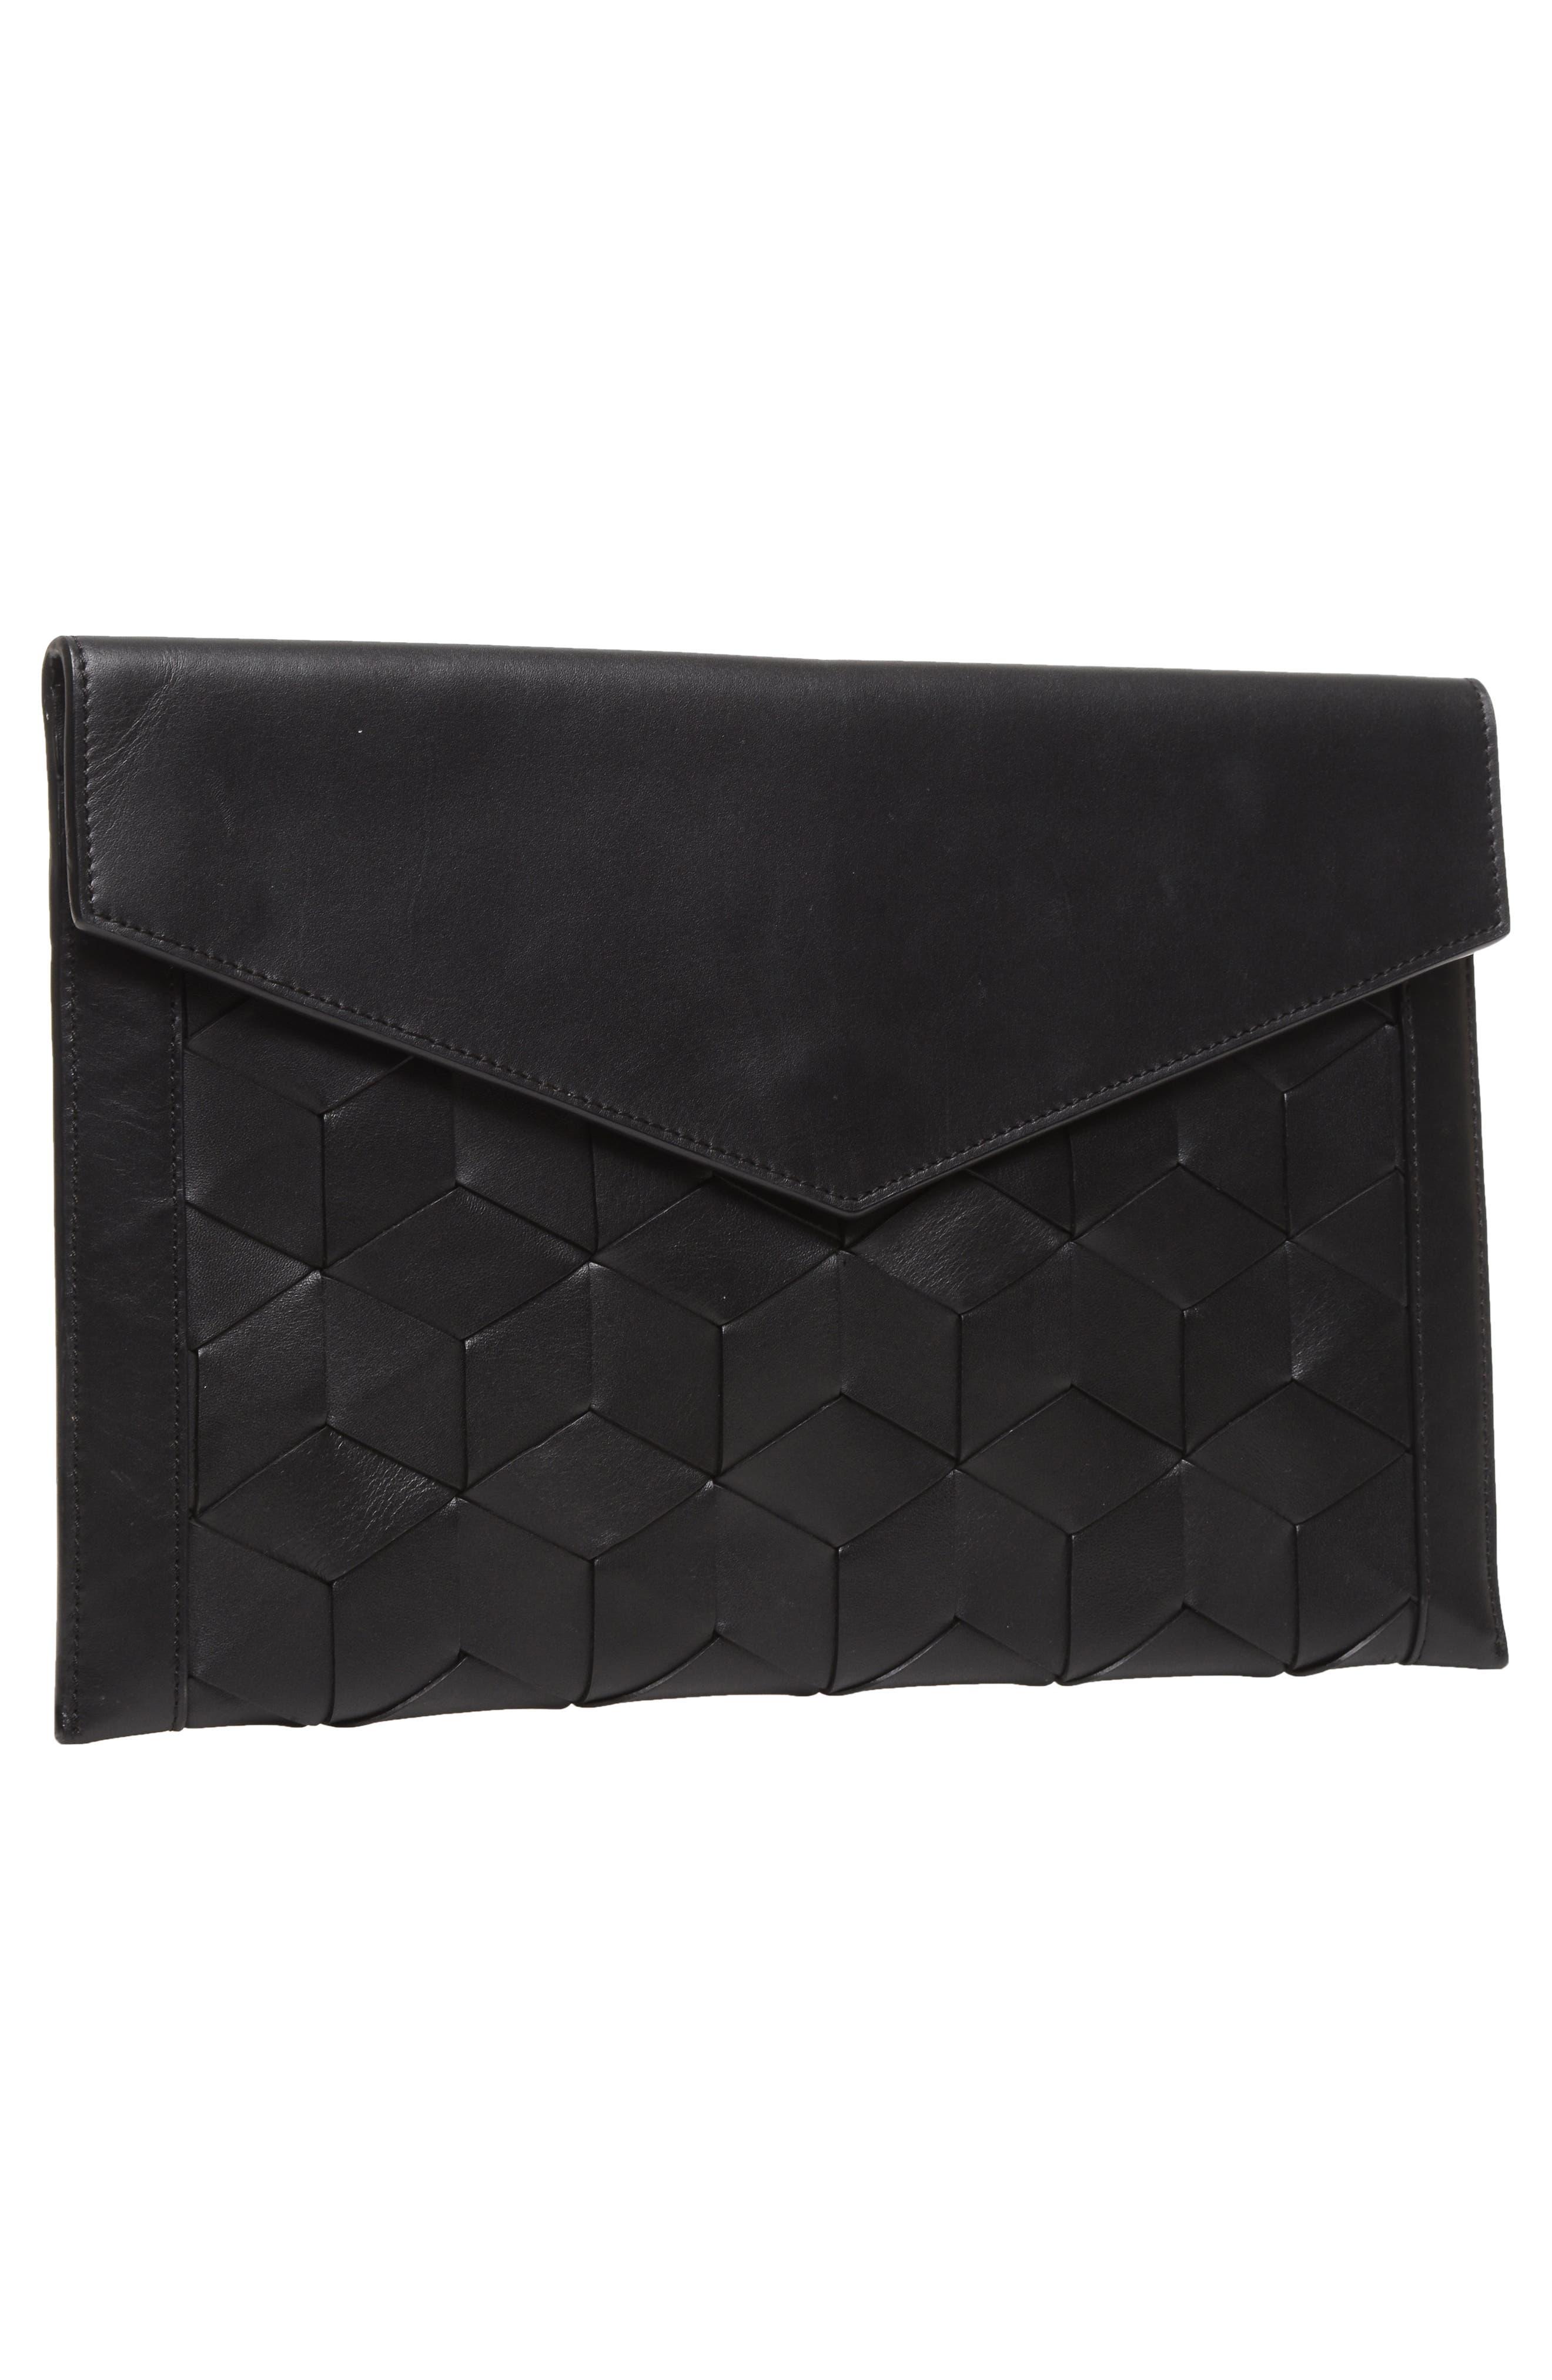 Mingle Woven Calfskin Leather Clutch,                             Alternate thumbnail 8, color,                             BLACK